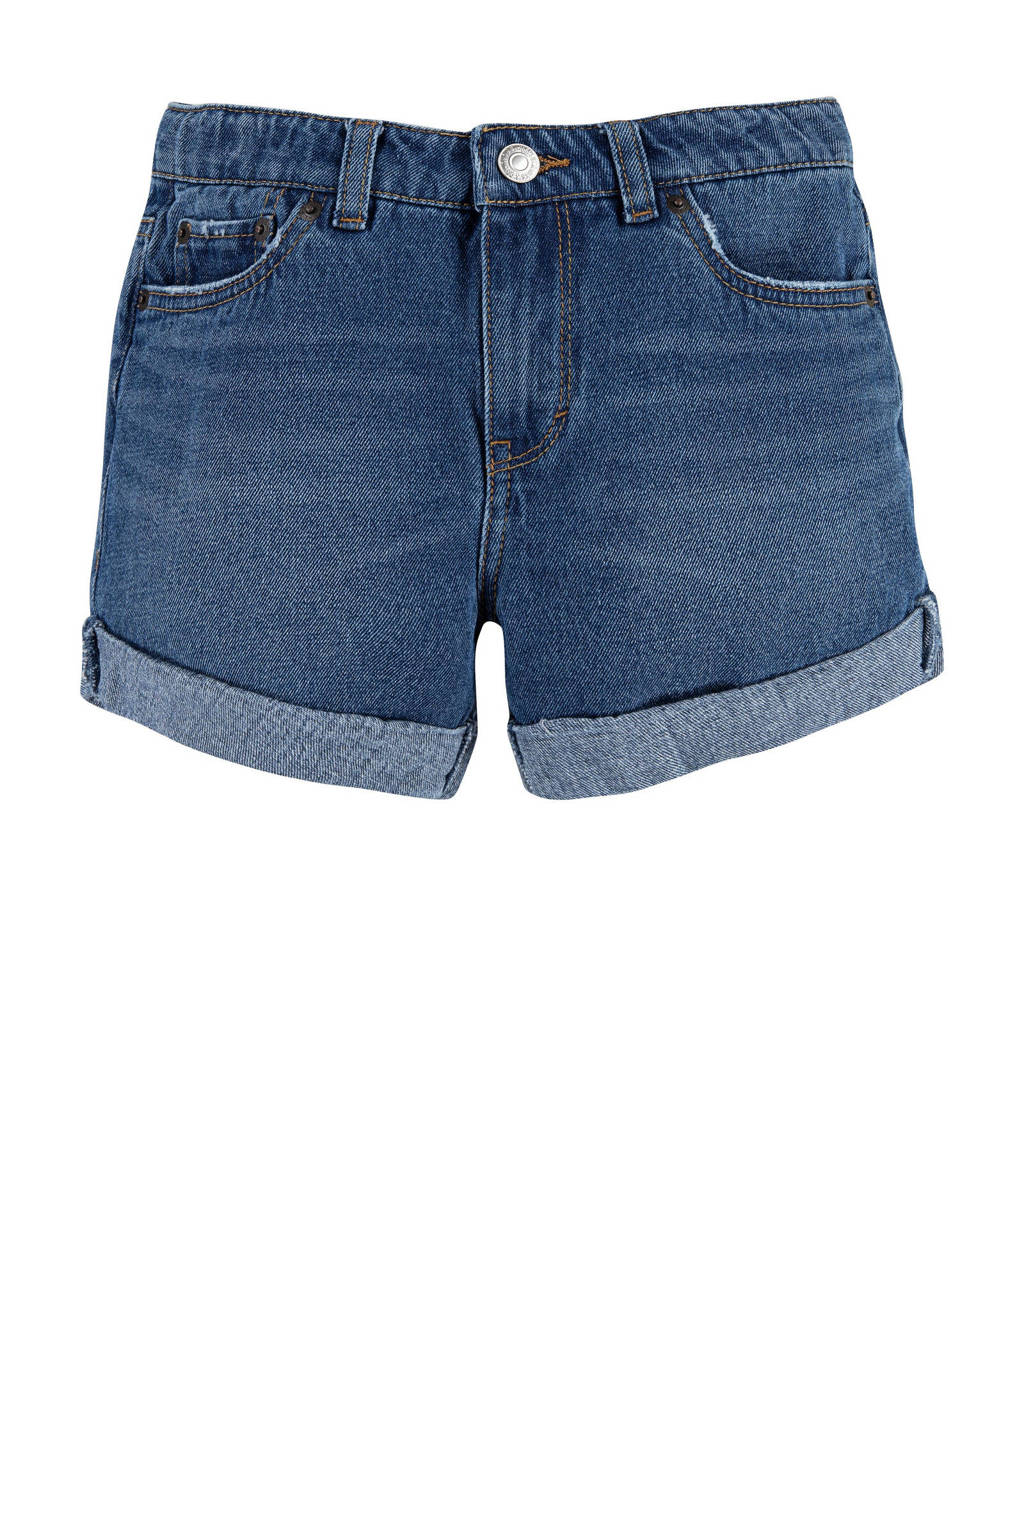 Levi's Kids Girlfriend shorty loose fit jeans short eviema3, EVIEMA3